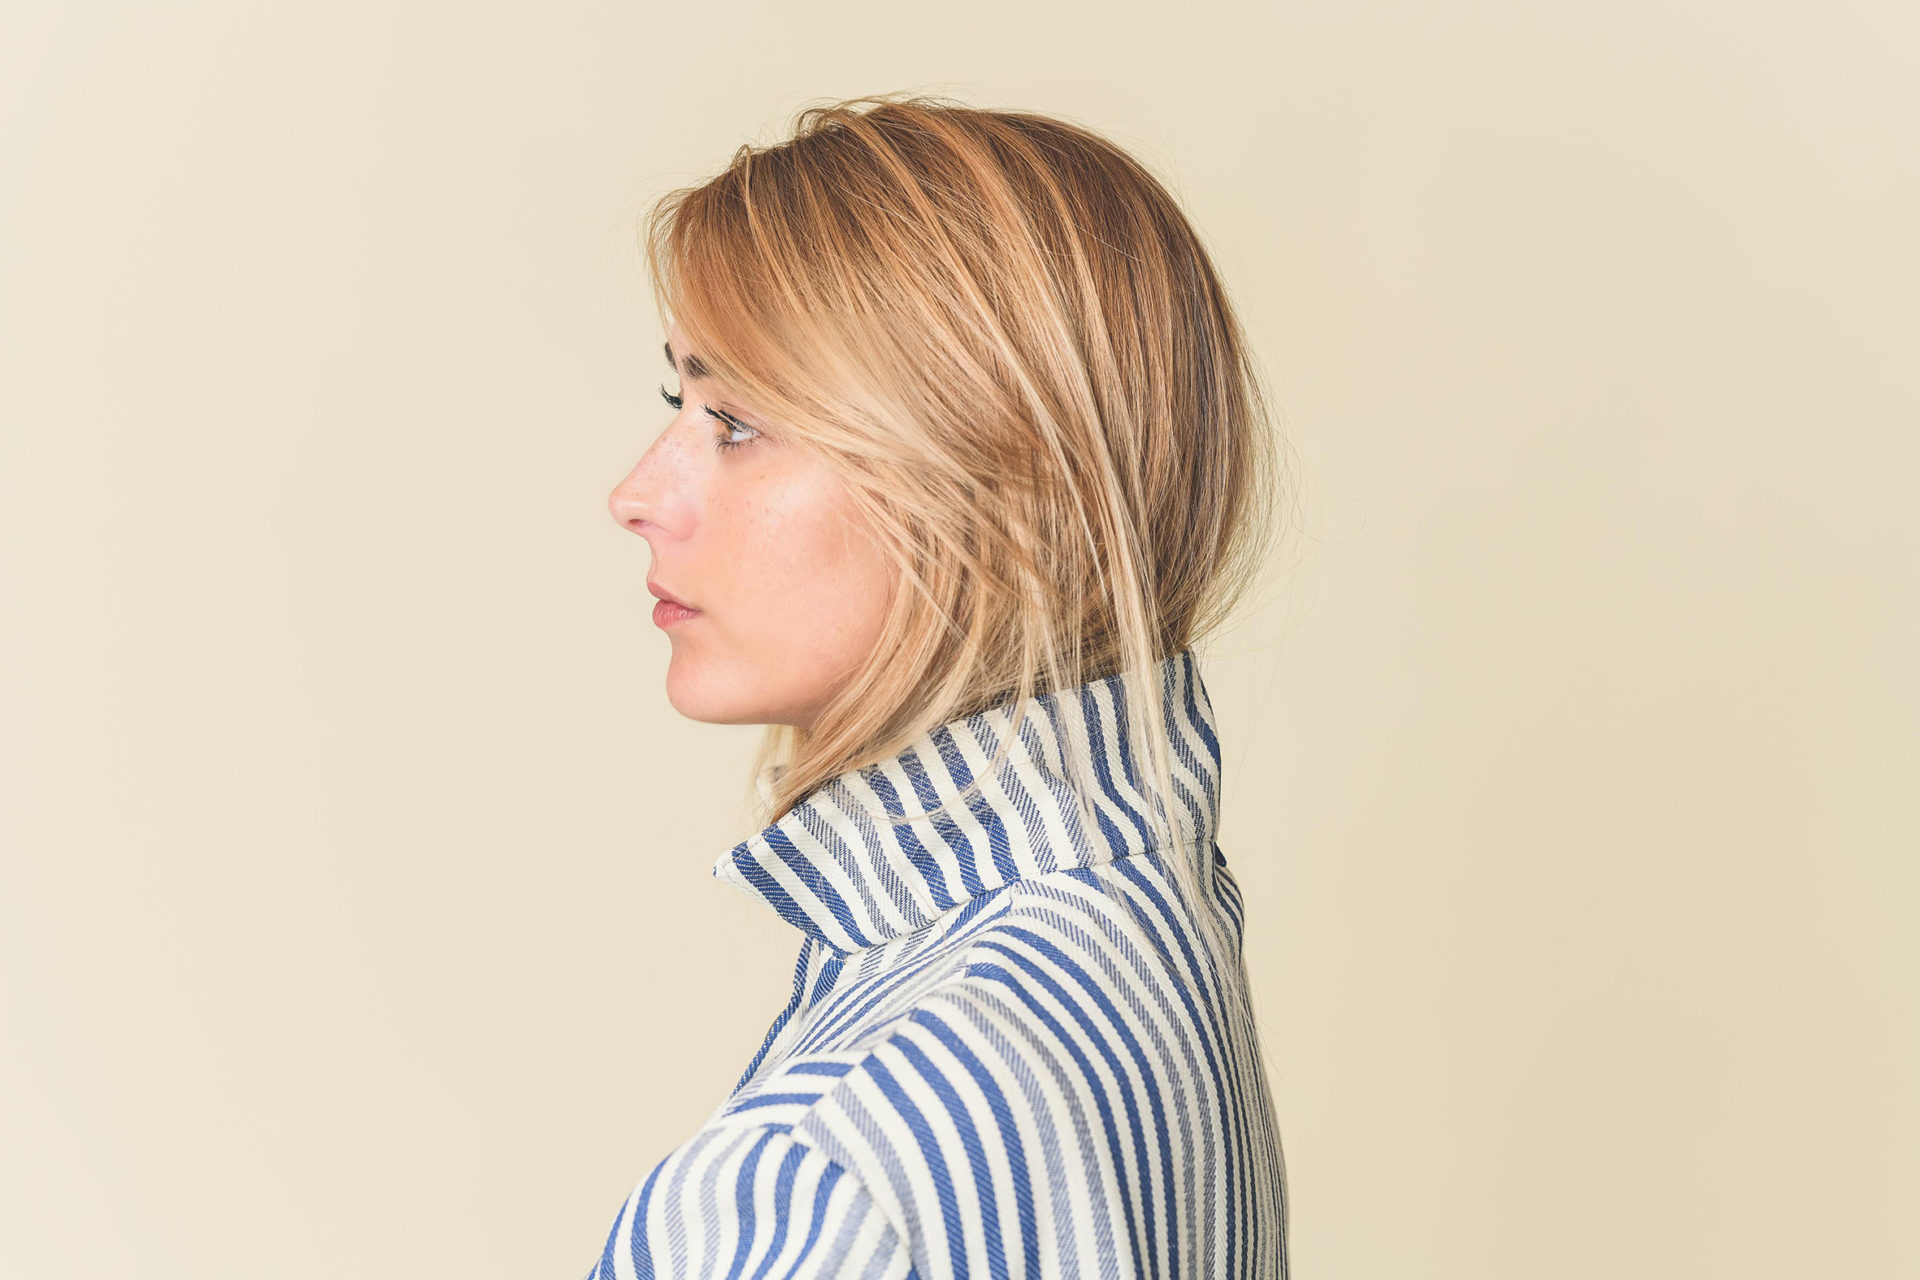 Laurent-scavone-photographe-mode-studio-lille-126